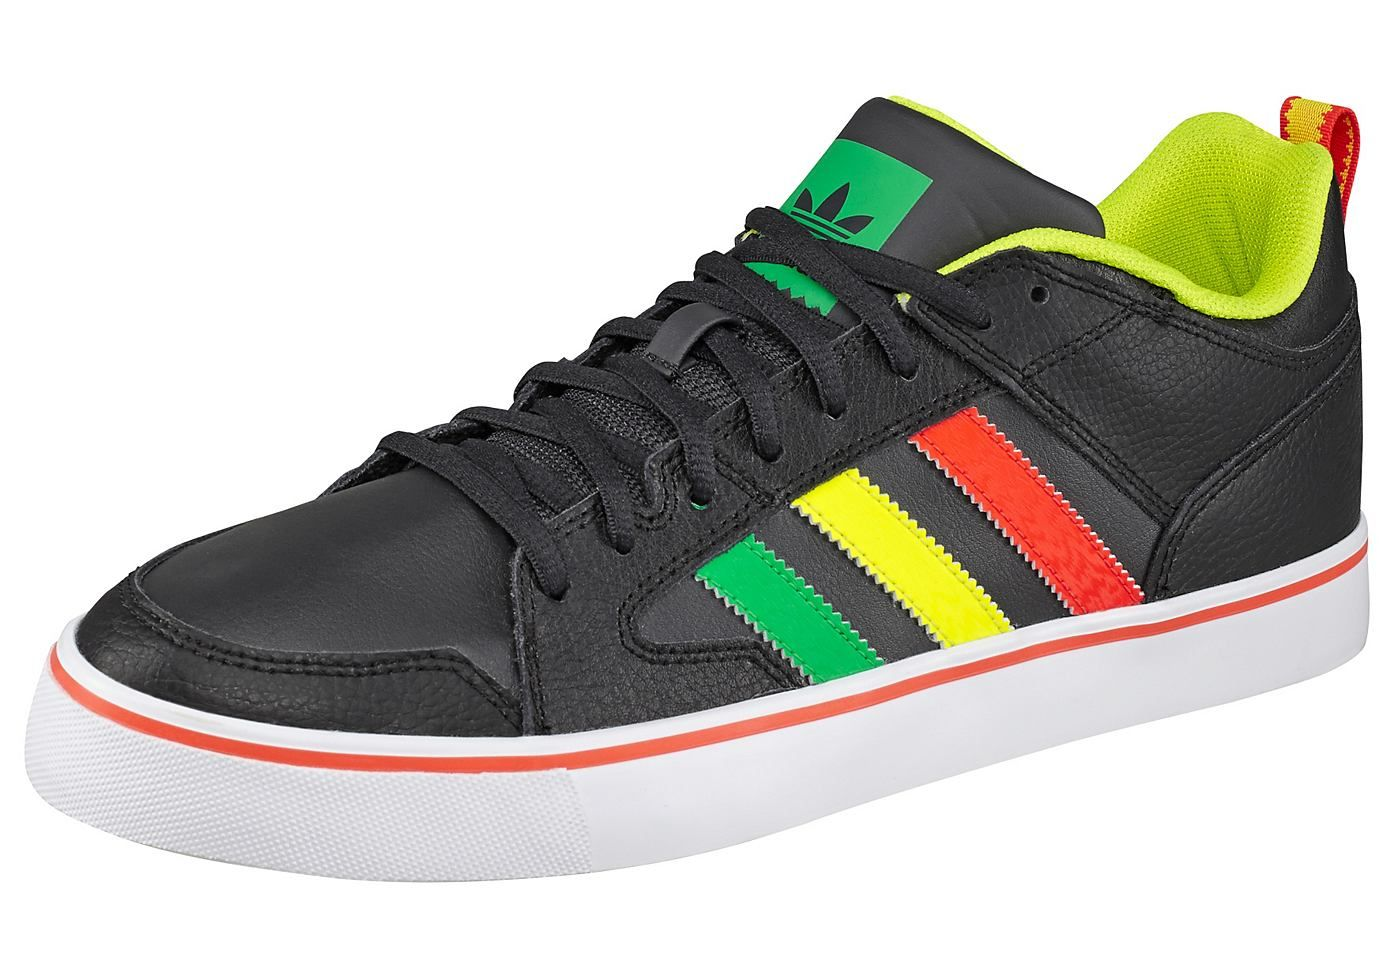 NU 20% KORTING: ADIDAS ORIGINALS Sneakers Varial II Low - http://www.musteredlady.com/nu-20-korting-adidas-originals-sneakers-varial-ii-low/  .. http://goo.gl/aaUewU    MusteredLady.com